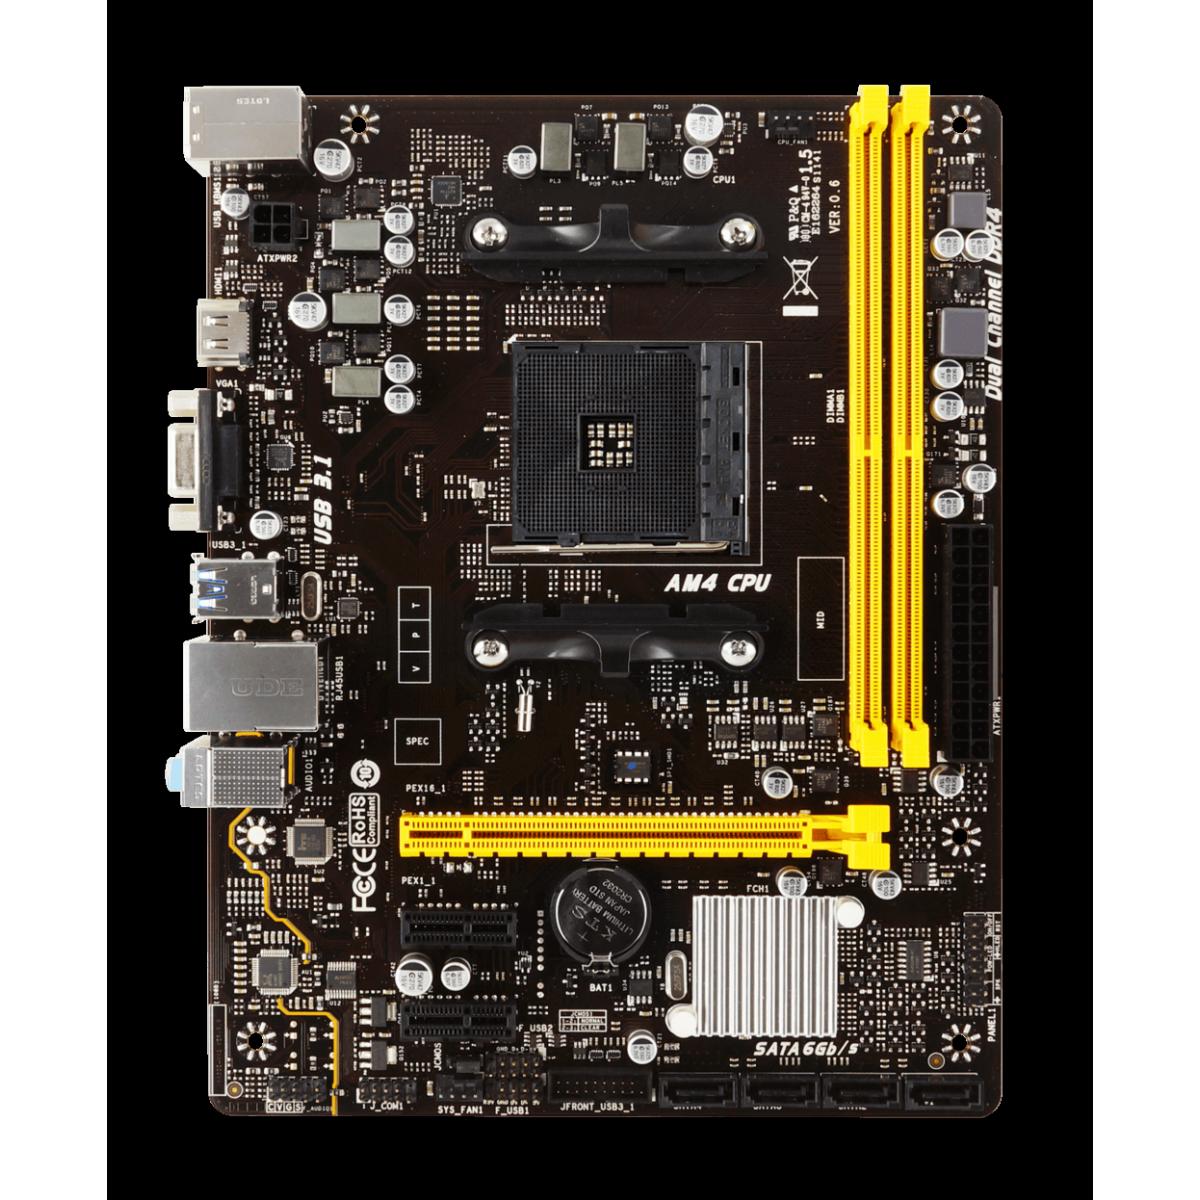 Kit Upgrade Biostar Radeon Rx 550 2GB + Ryzen 3 3300x + Biostar A320MH + Memória DDR4 16GB (2x8GB) 3000MHz + Cooler de Brinde